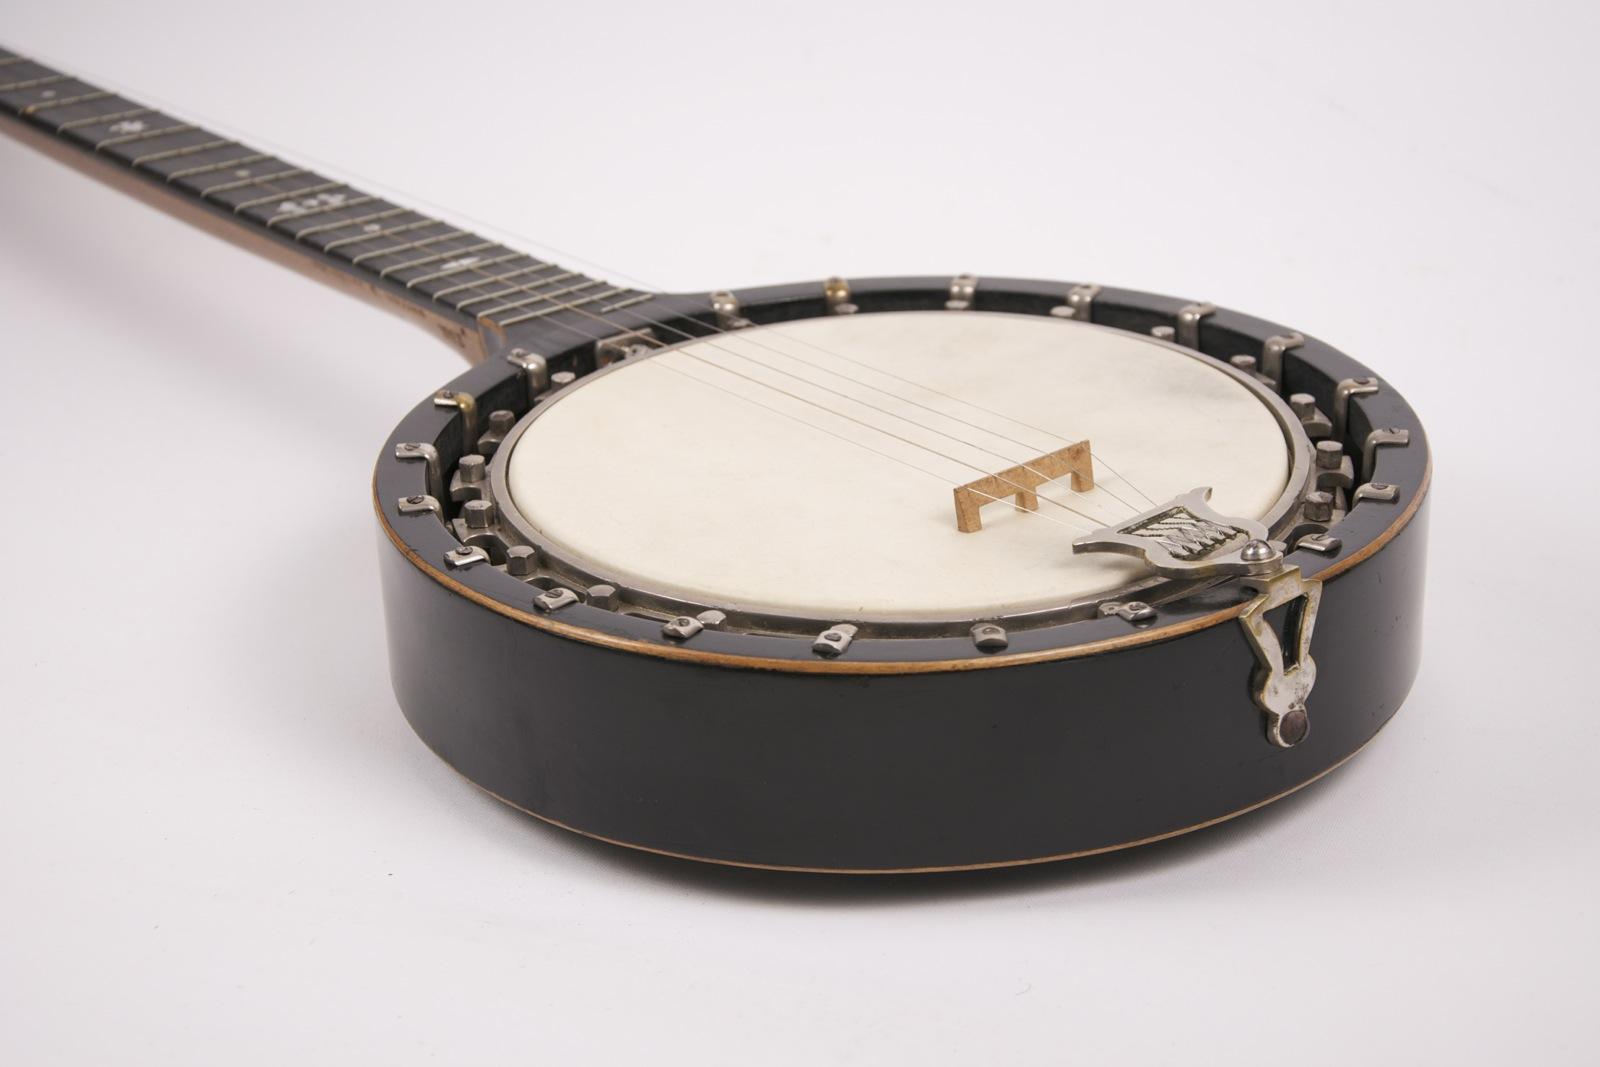 1873-banjo-Barnes-Mullins-5